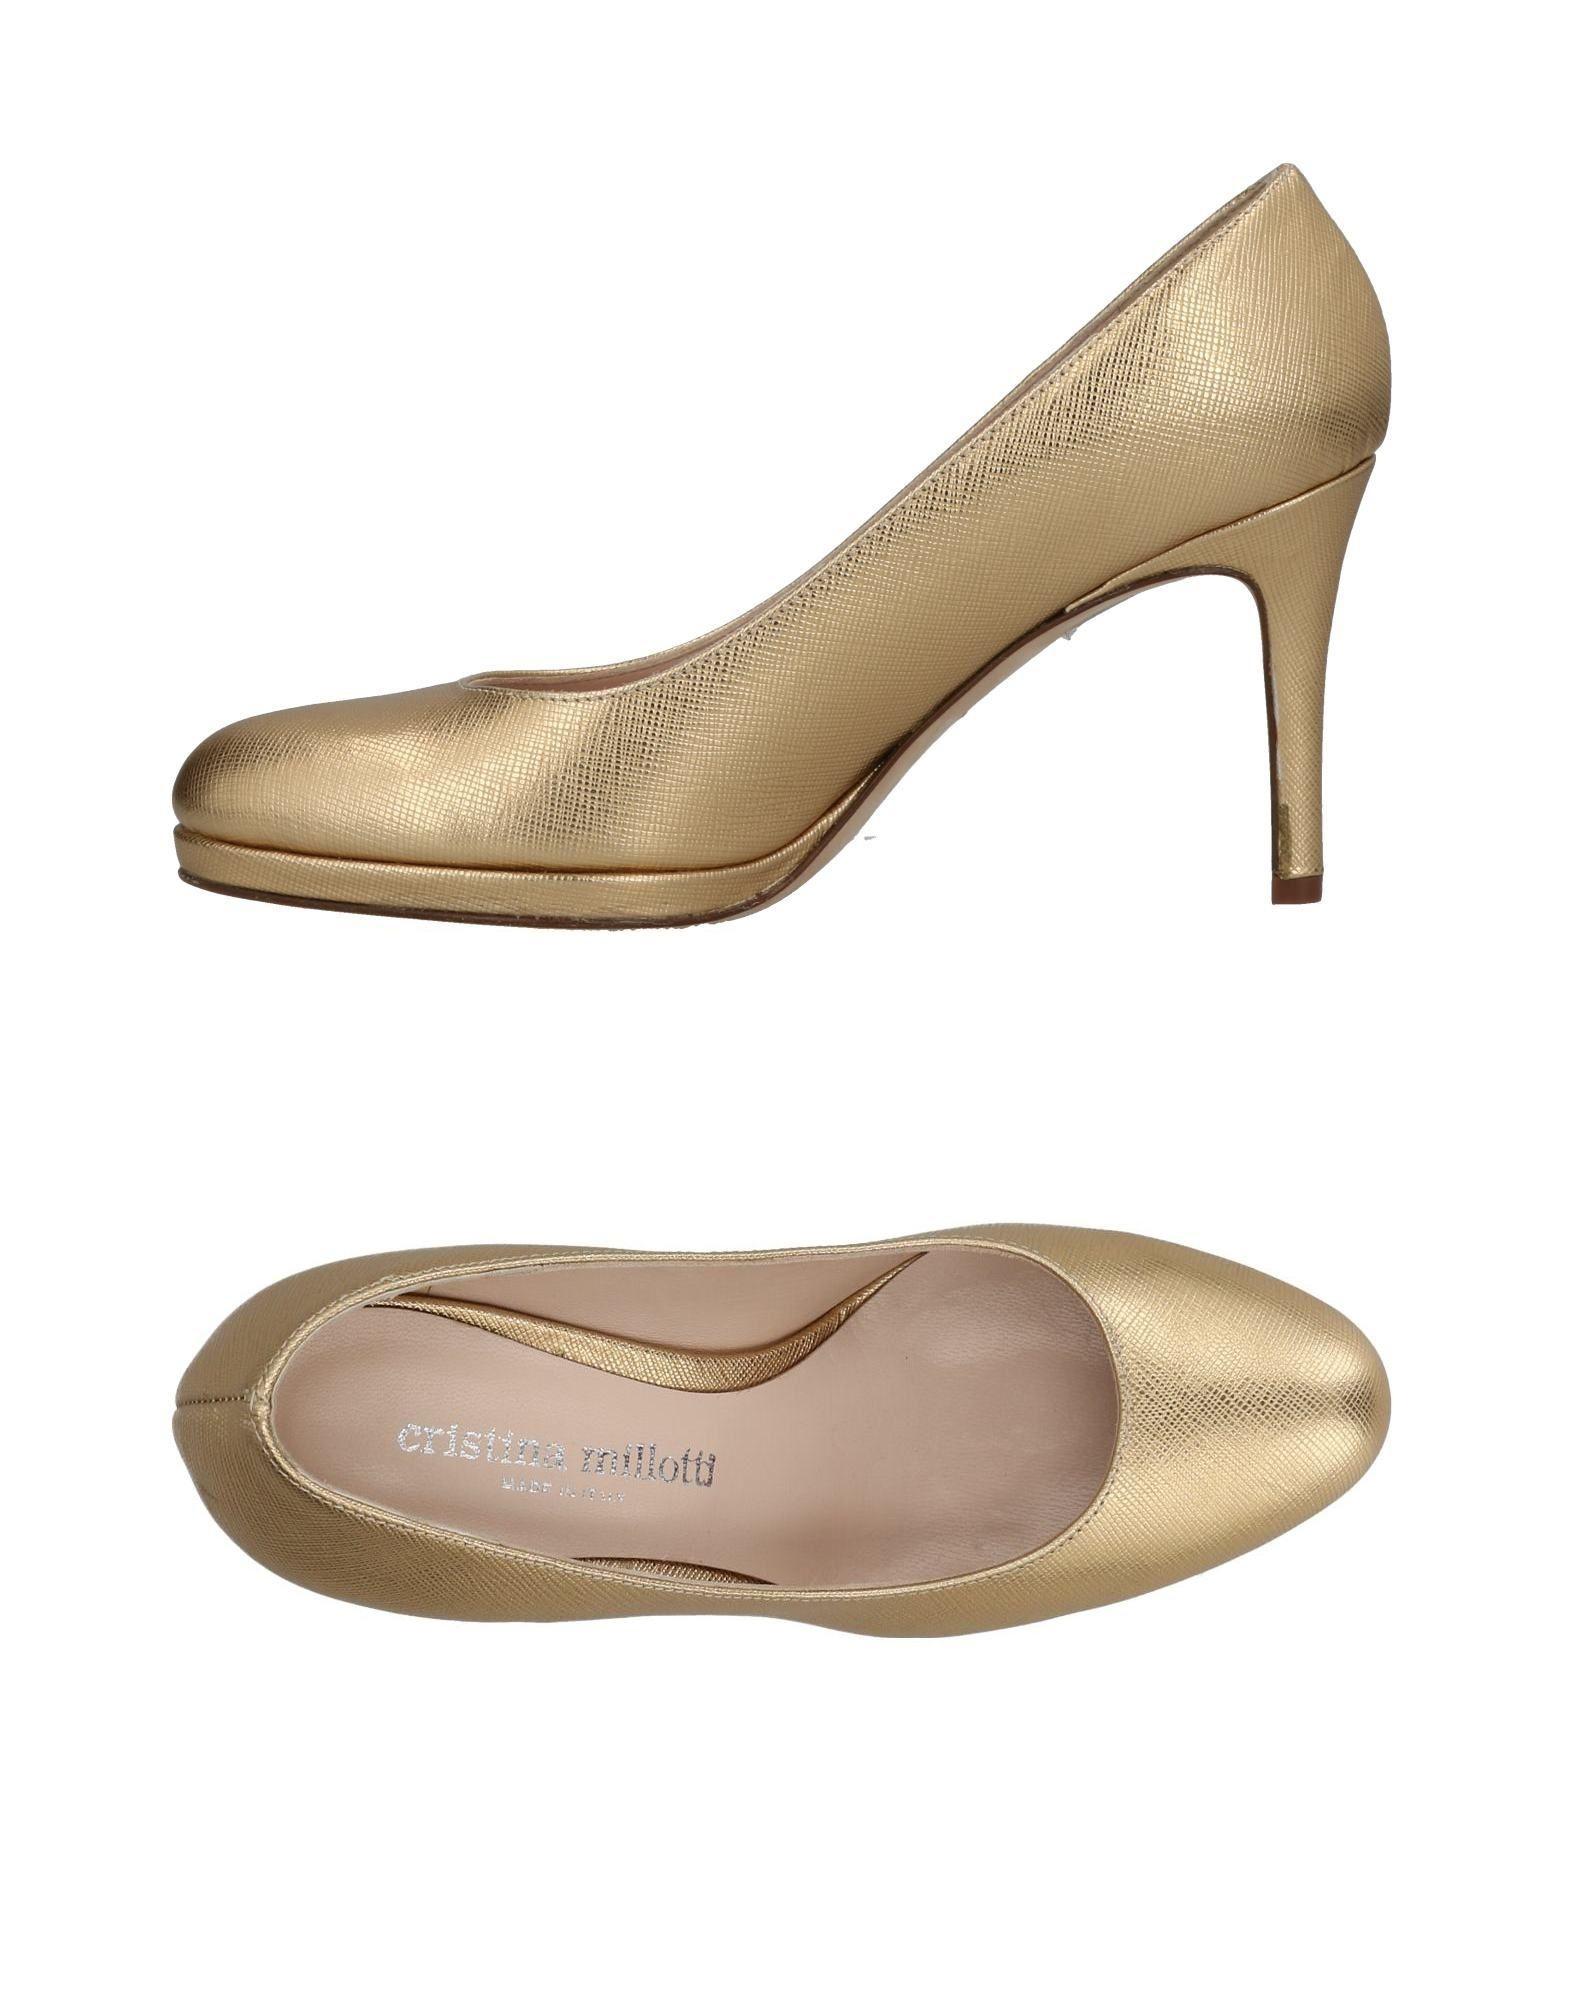 Cristina Pumps Millotti Pumps Cristina Damen  11457929WX Gute Qualität beliebte Schuhe 070afb